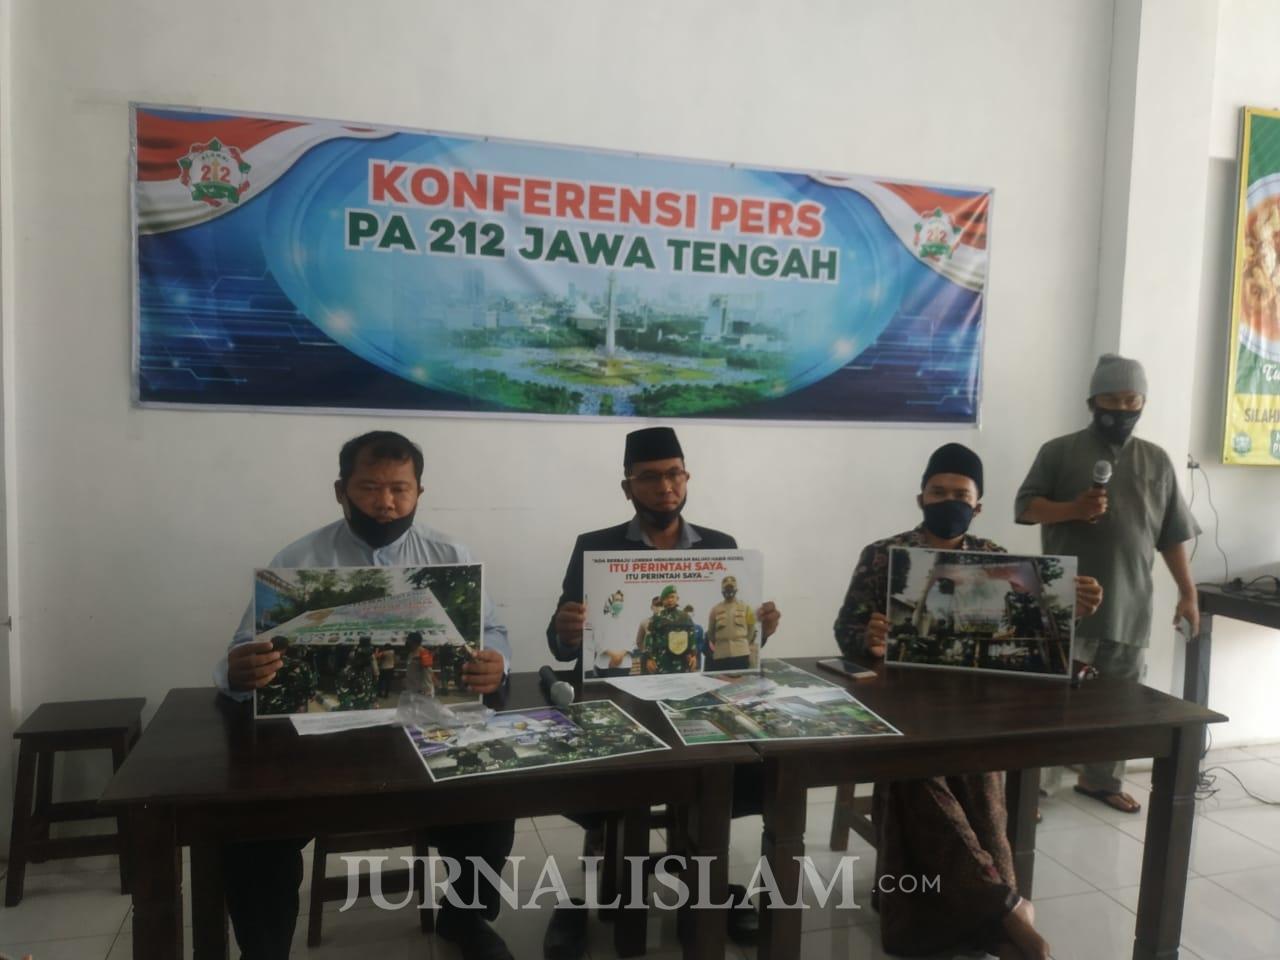 PA 212: Berdasar UU Kewenangan TNI Jaga Kedaulatan, Bukan Copot Baliho